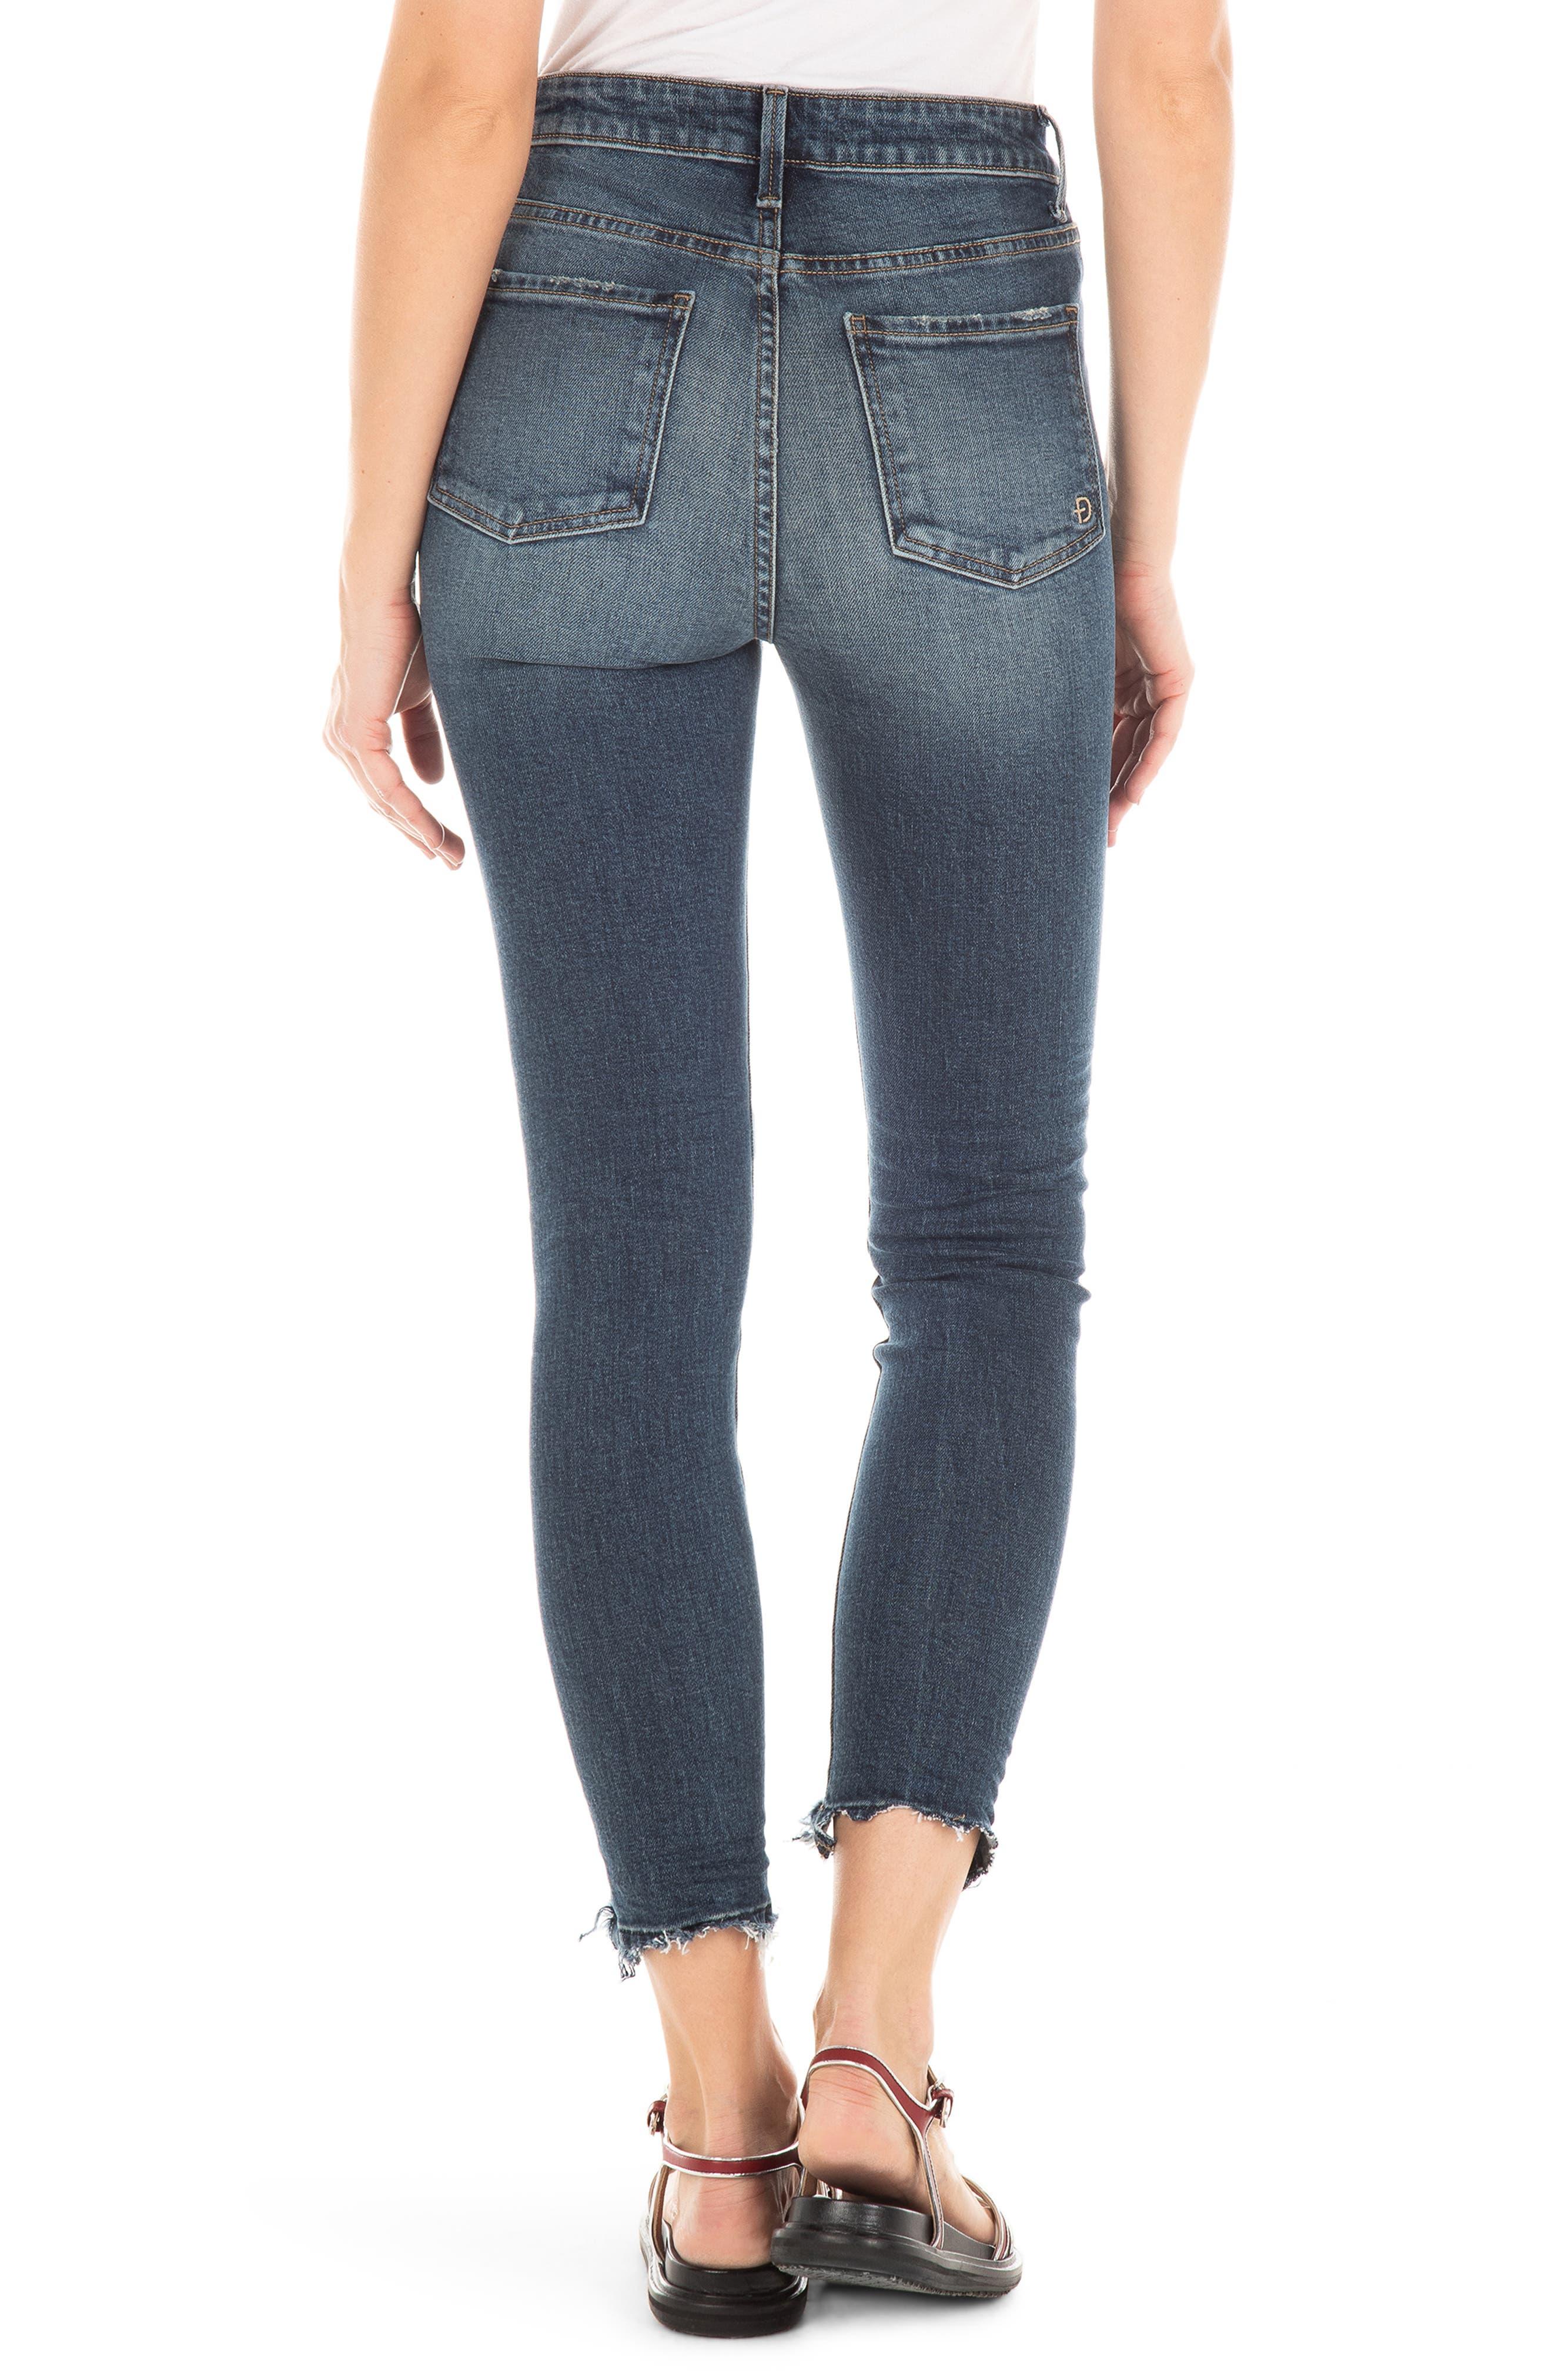 FIDELITY DENIM,                             Luna Ripped High Waist Crop Skinny Jeans,                             Alternate thumbnail 2, color,                             ROCKAWAY BLUE